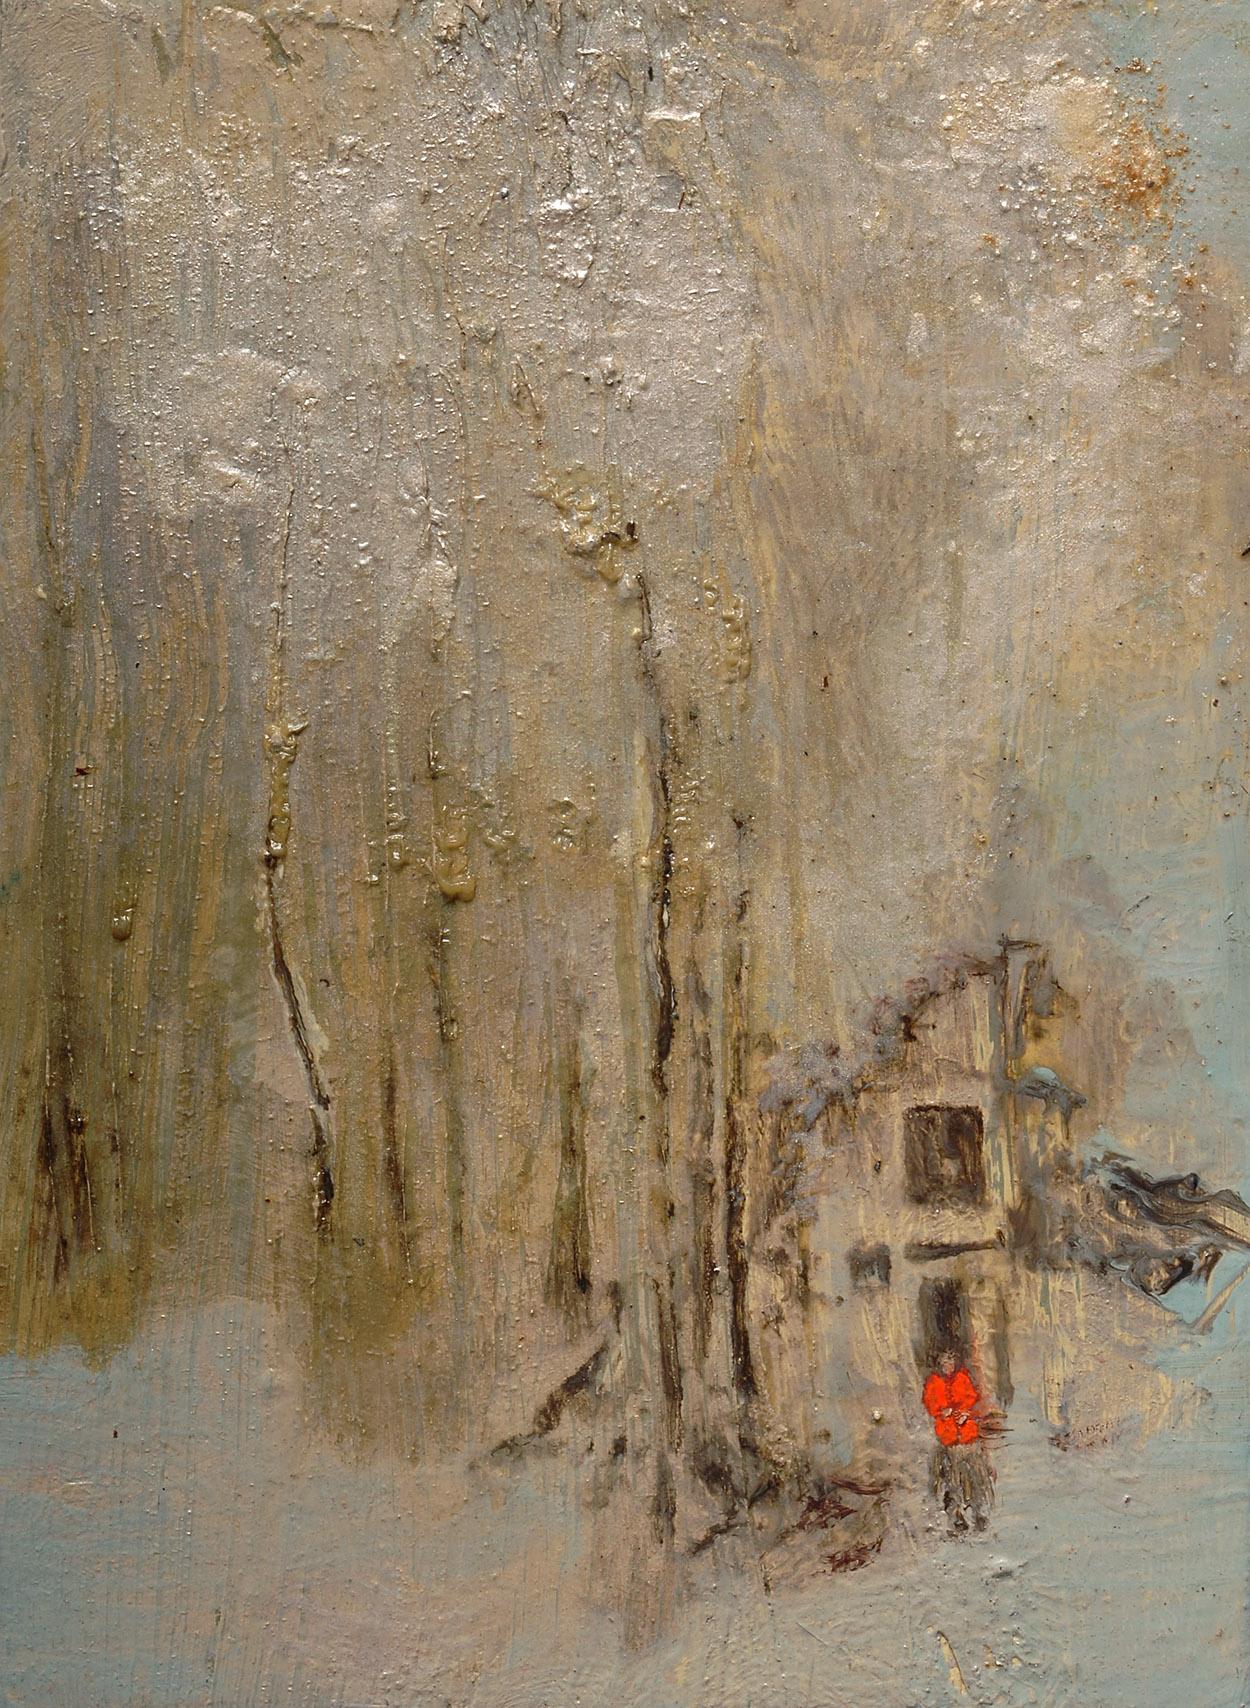 Chechenia, Rusia 2003   Oil paint, fluorescent and pigment on canvas. 16 x 22 cm.